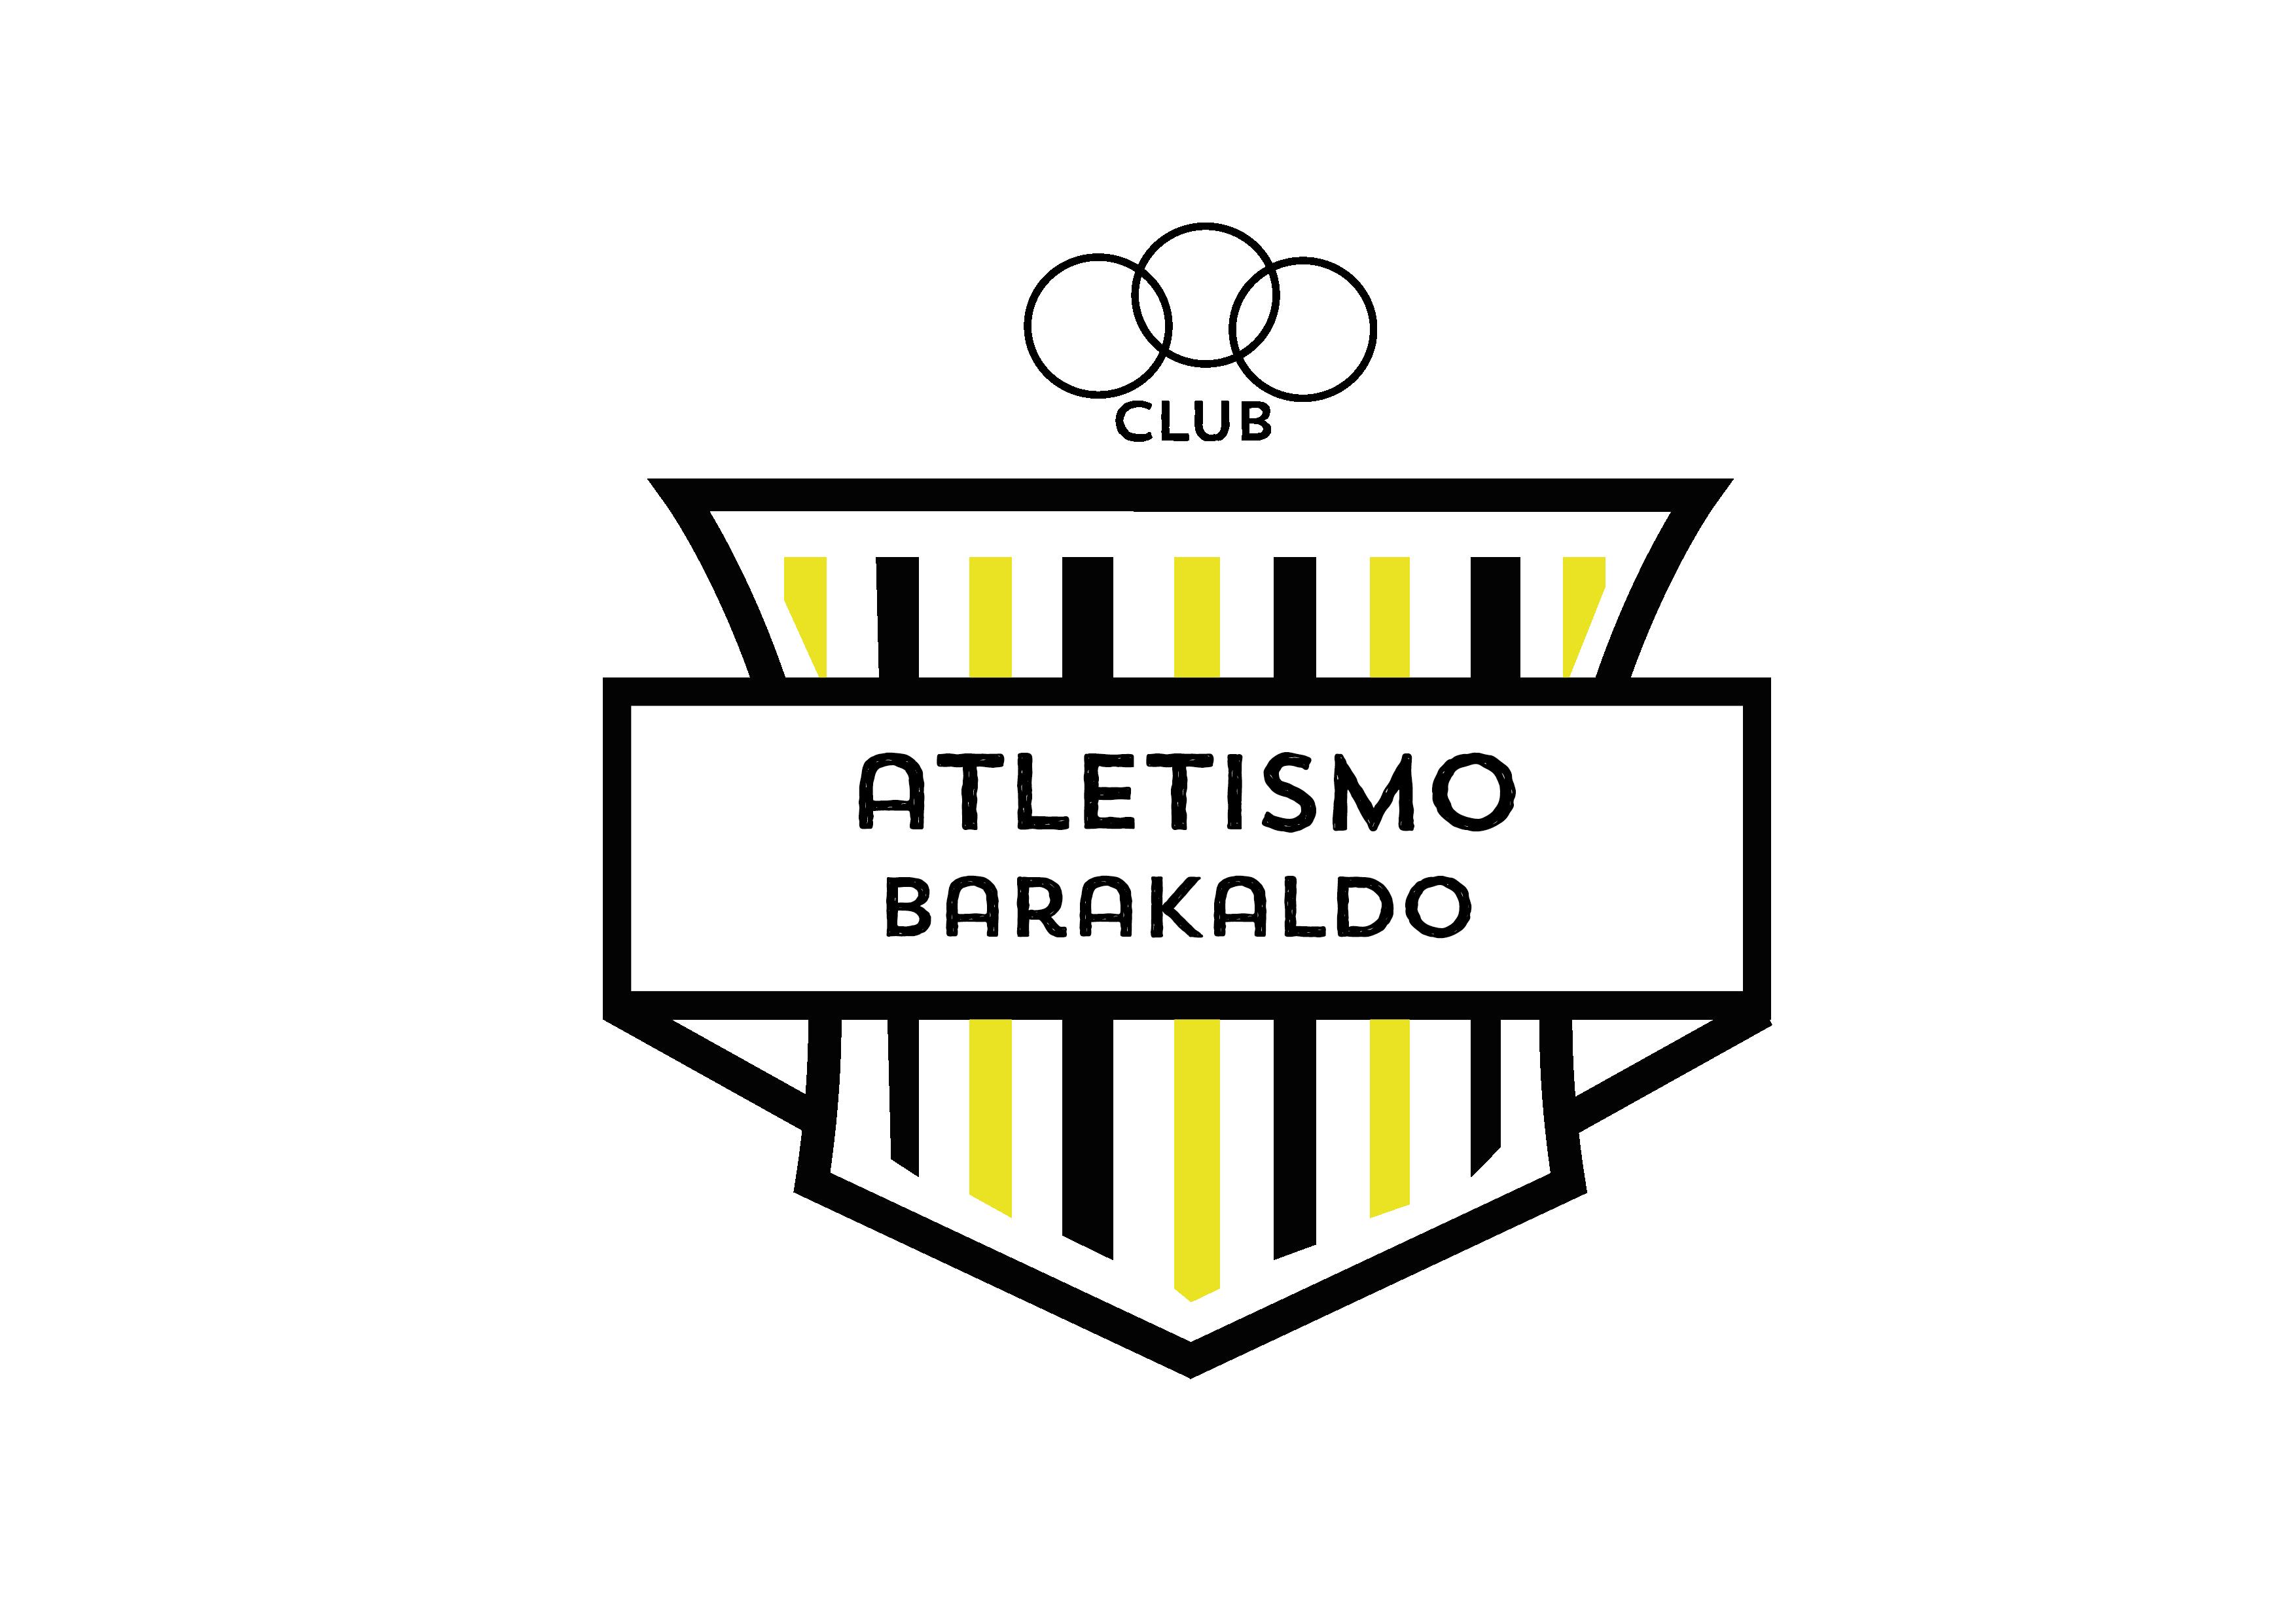 Club Atletismo Barakaldo en Durango para pruebas escolares